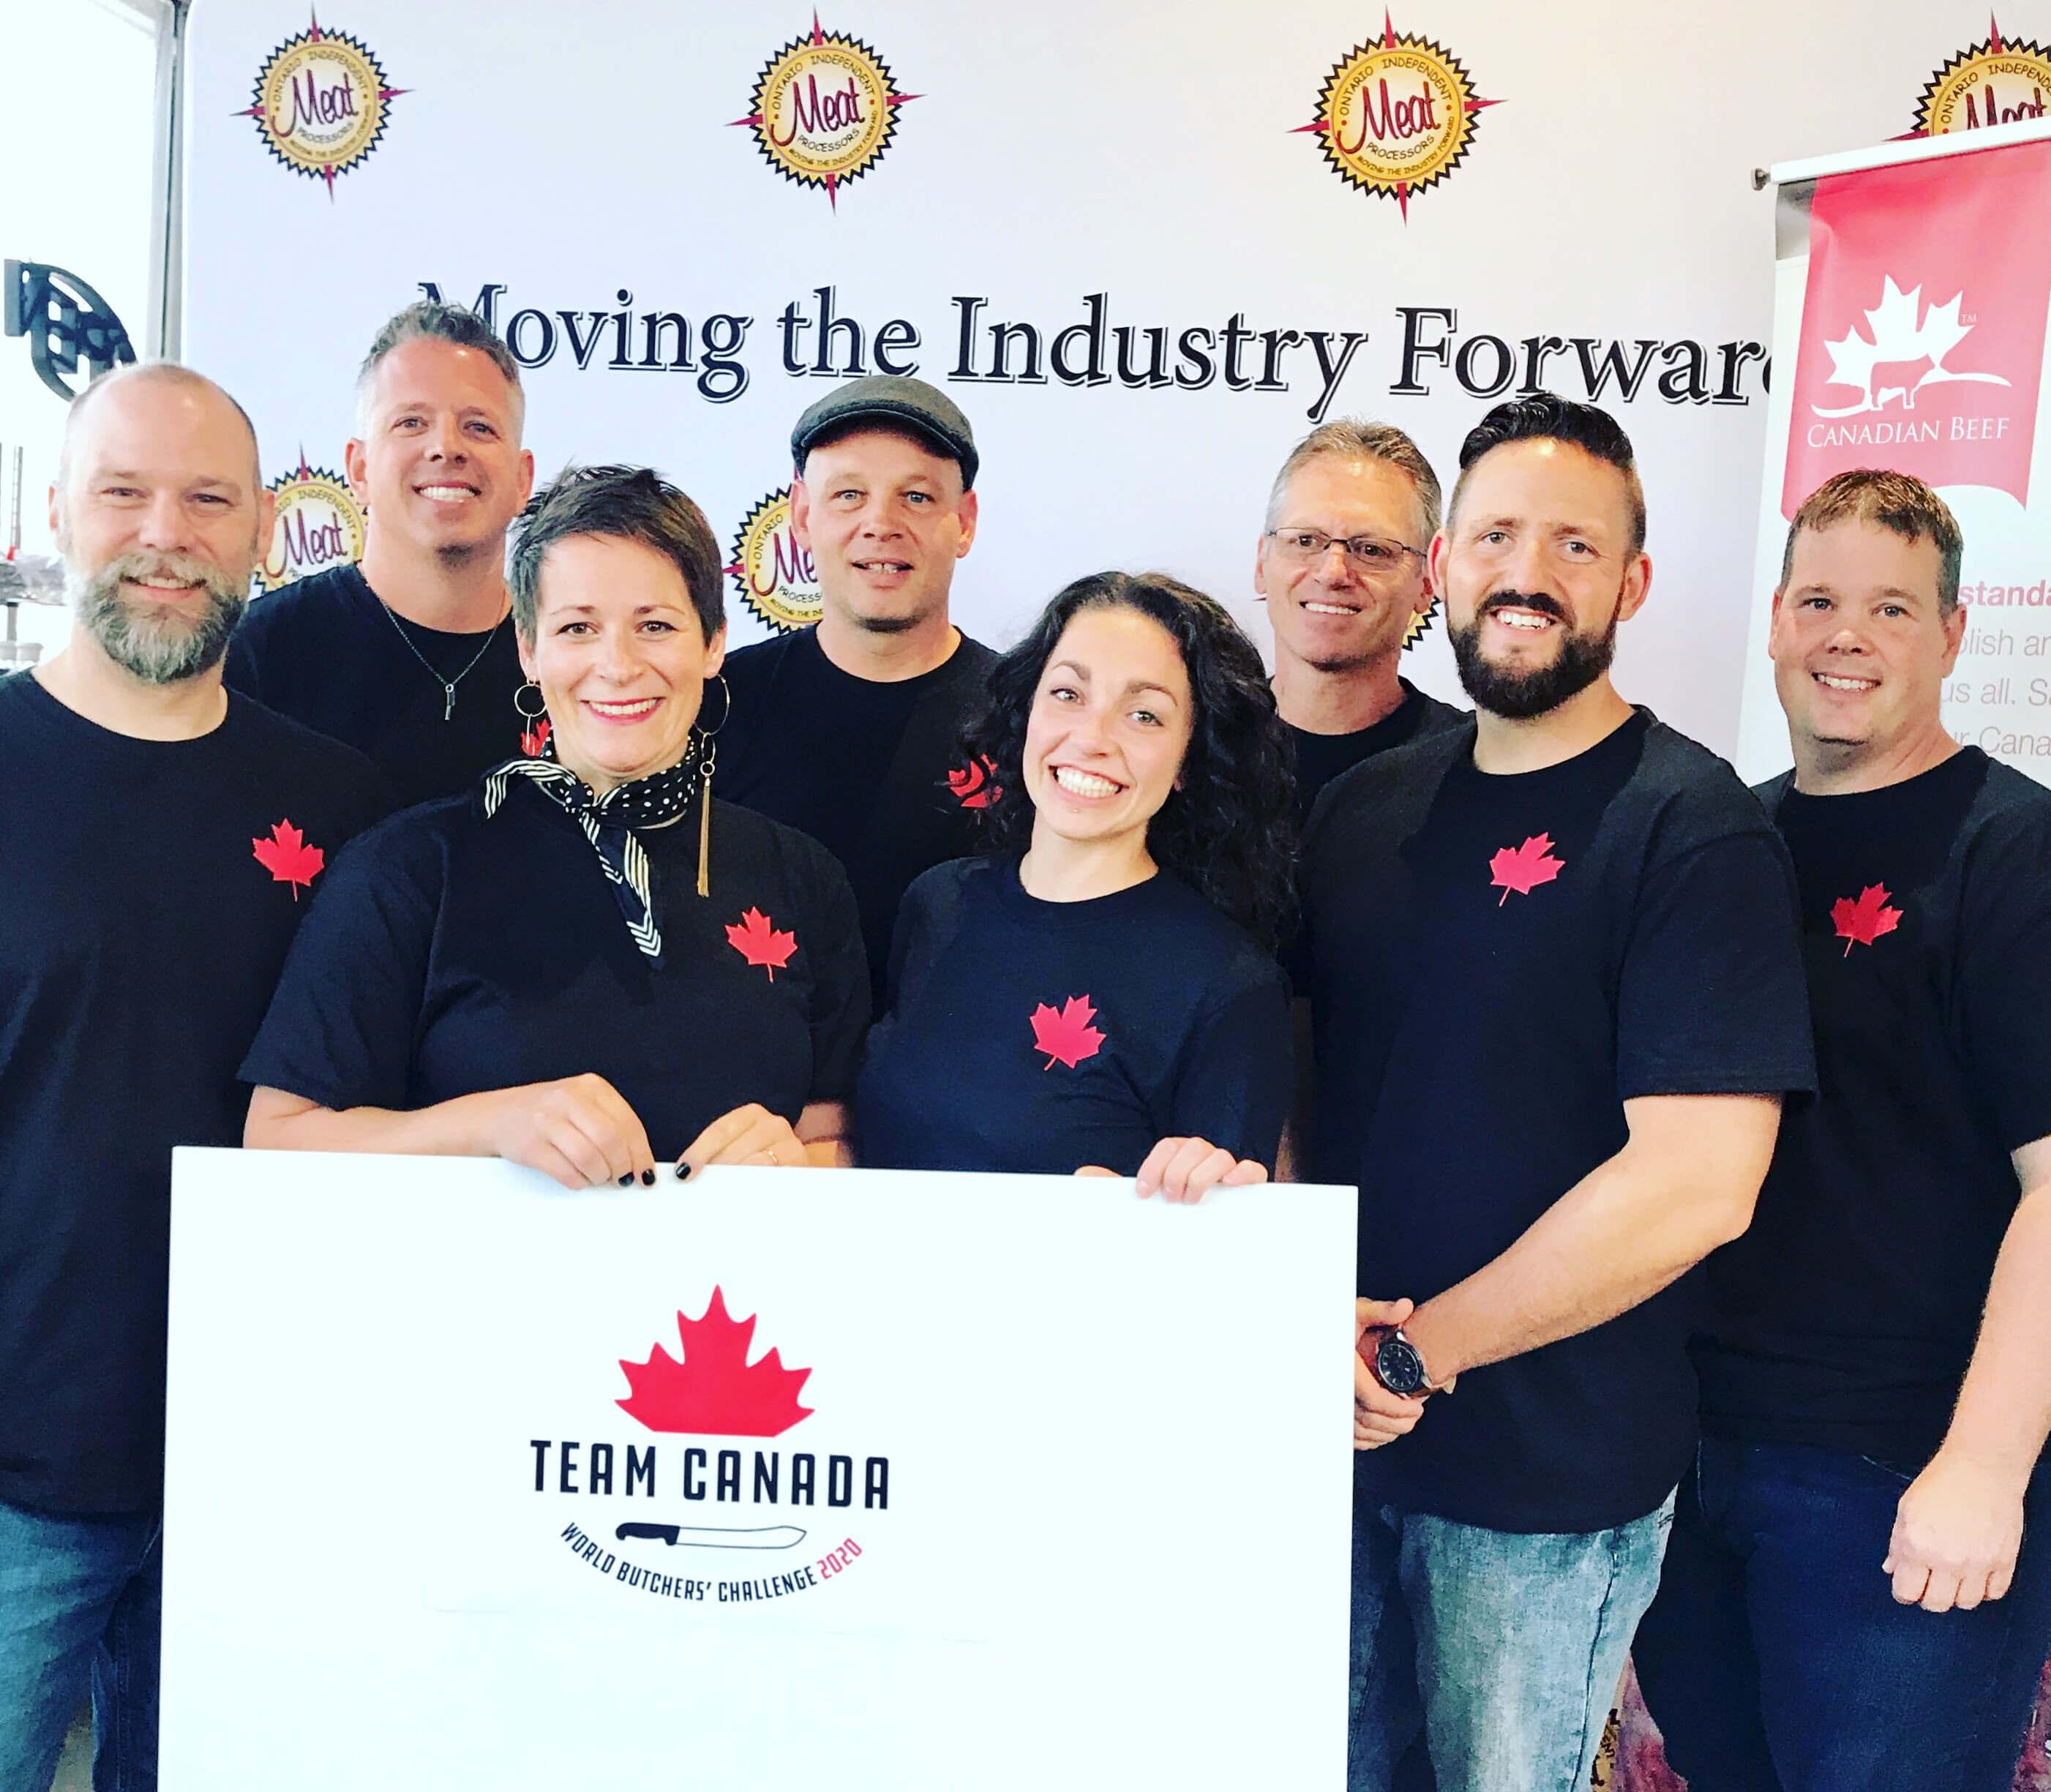 Team Canada photo (left to right): Corey Meyer, Brent Herrington, Elyse Chatterton, Peter Baarda, Taryn Lee Barker, Damian Goriup, Aaron McLaughlin, Dave Vander Velde